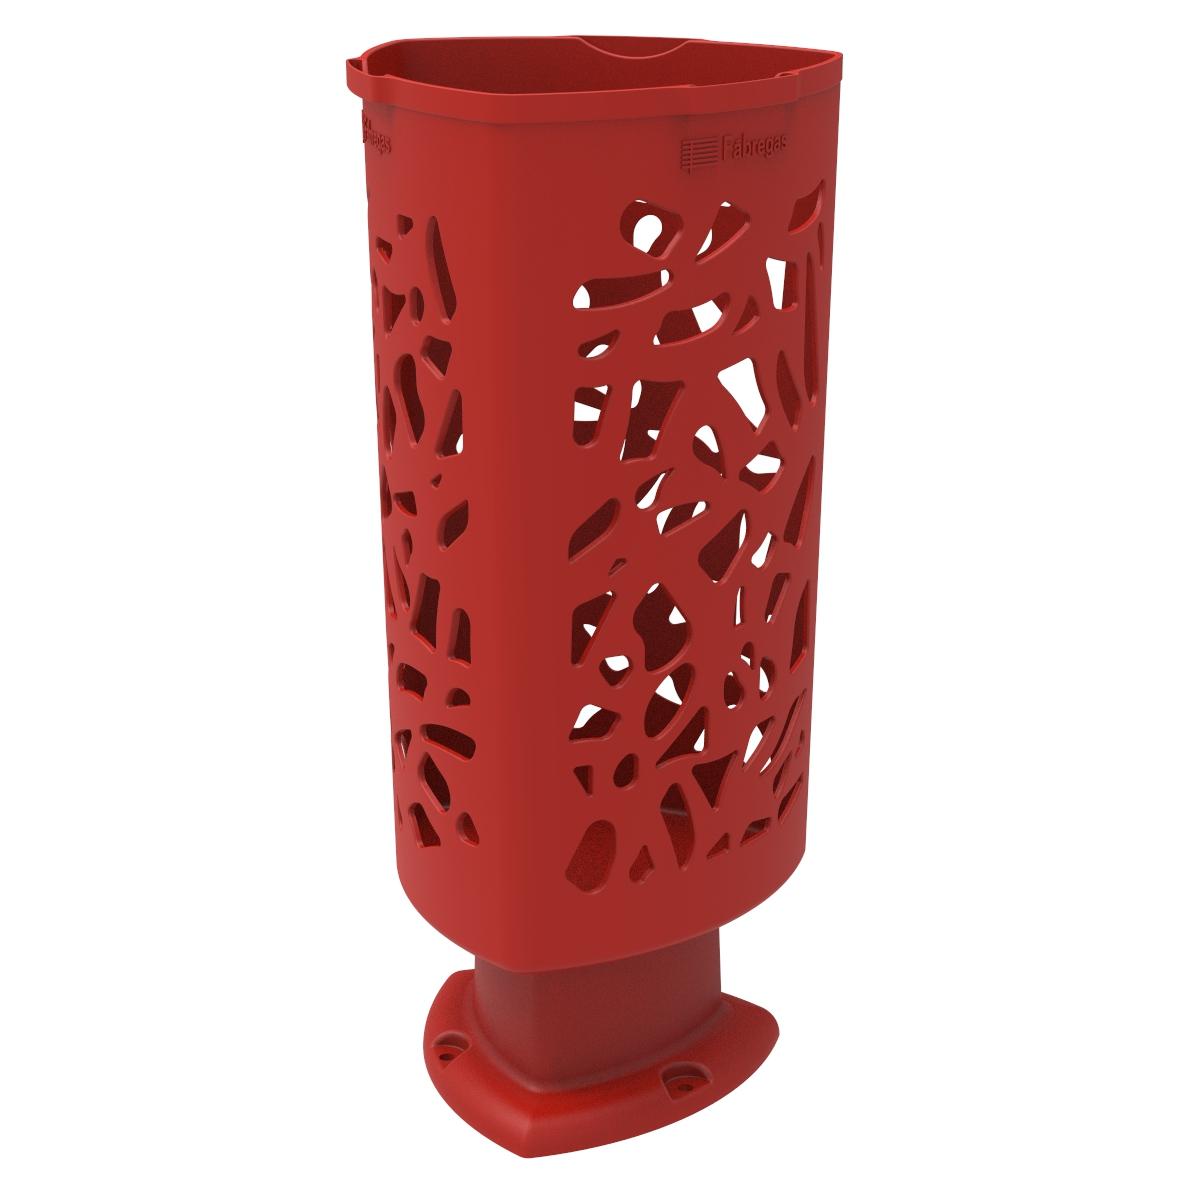 Paperera Scuderia de Polietilè color Vermell RAL 3020 per Carrer